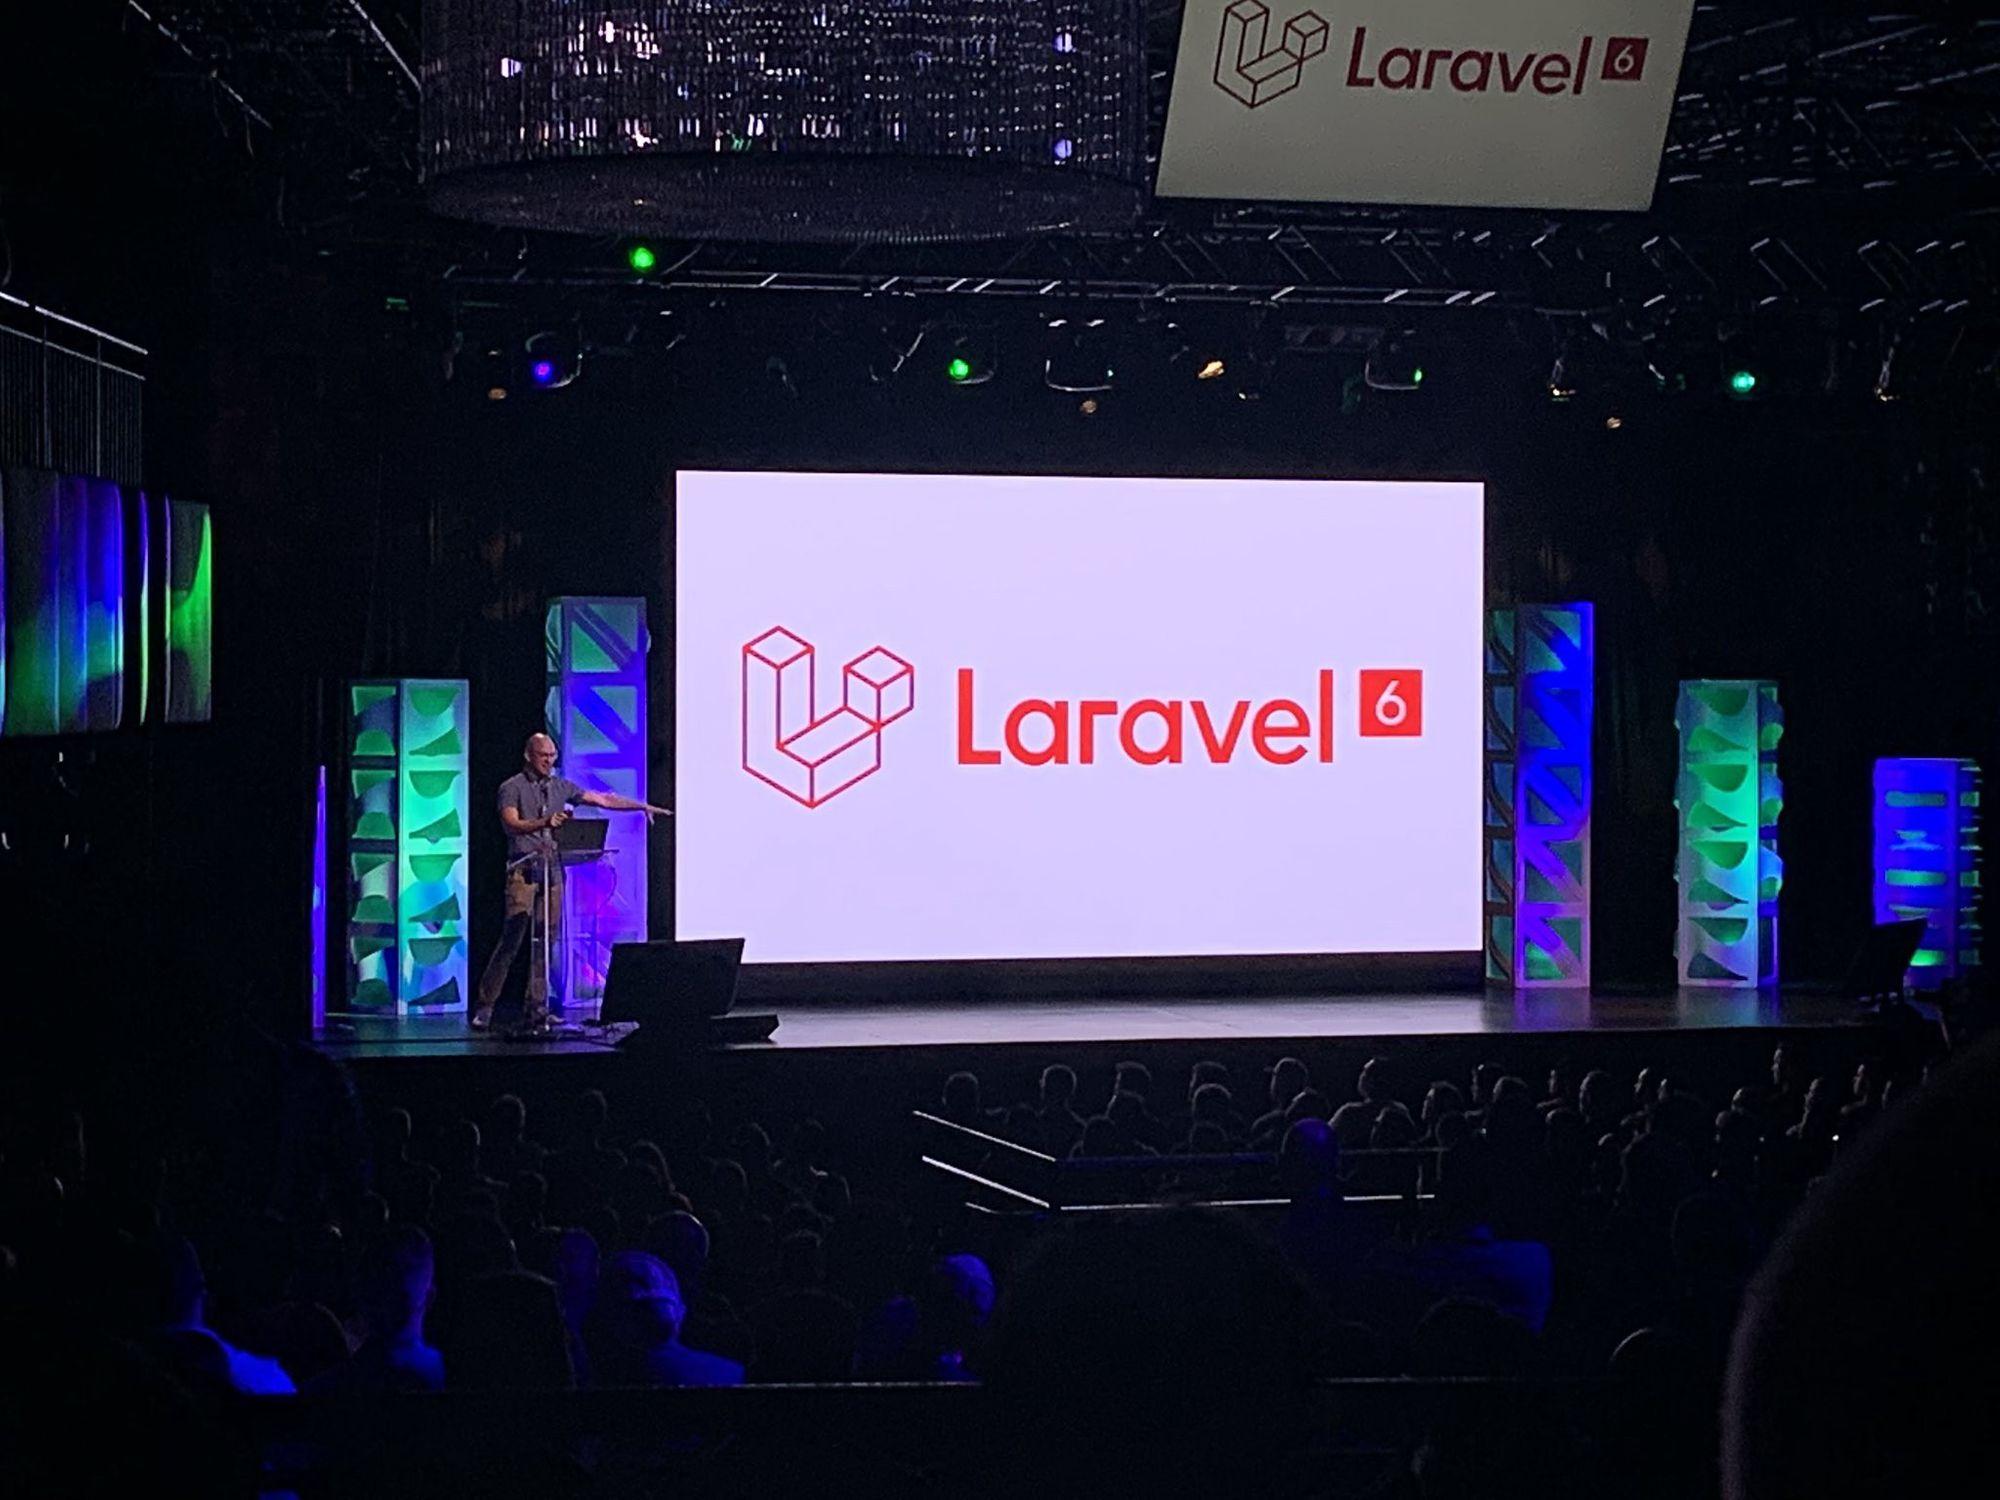 Laracon Laravel 2019 experience talks